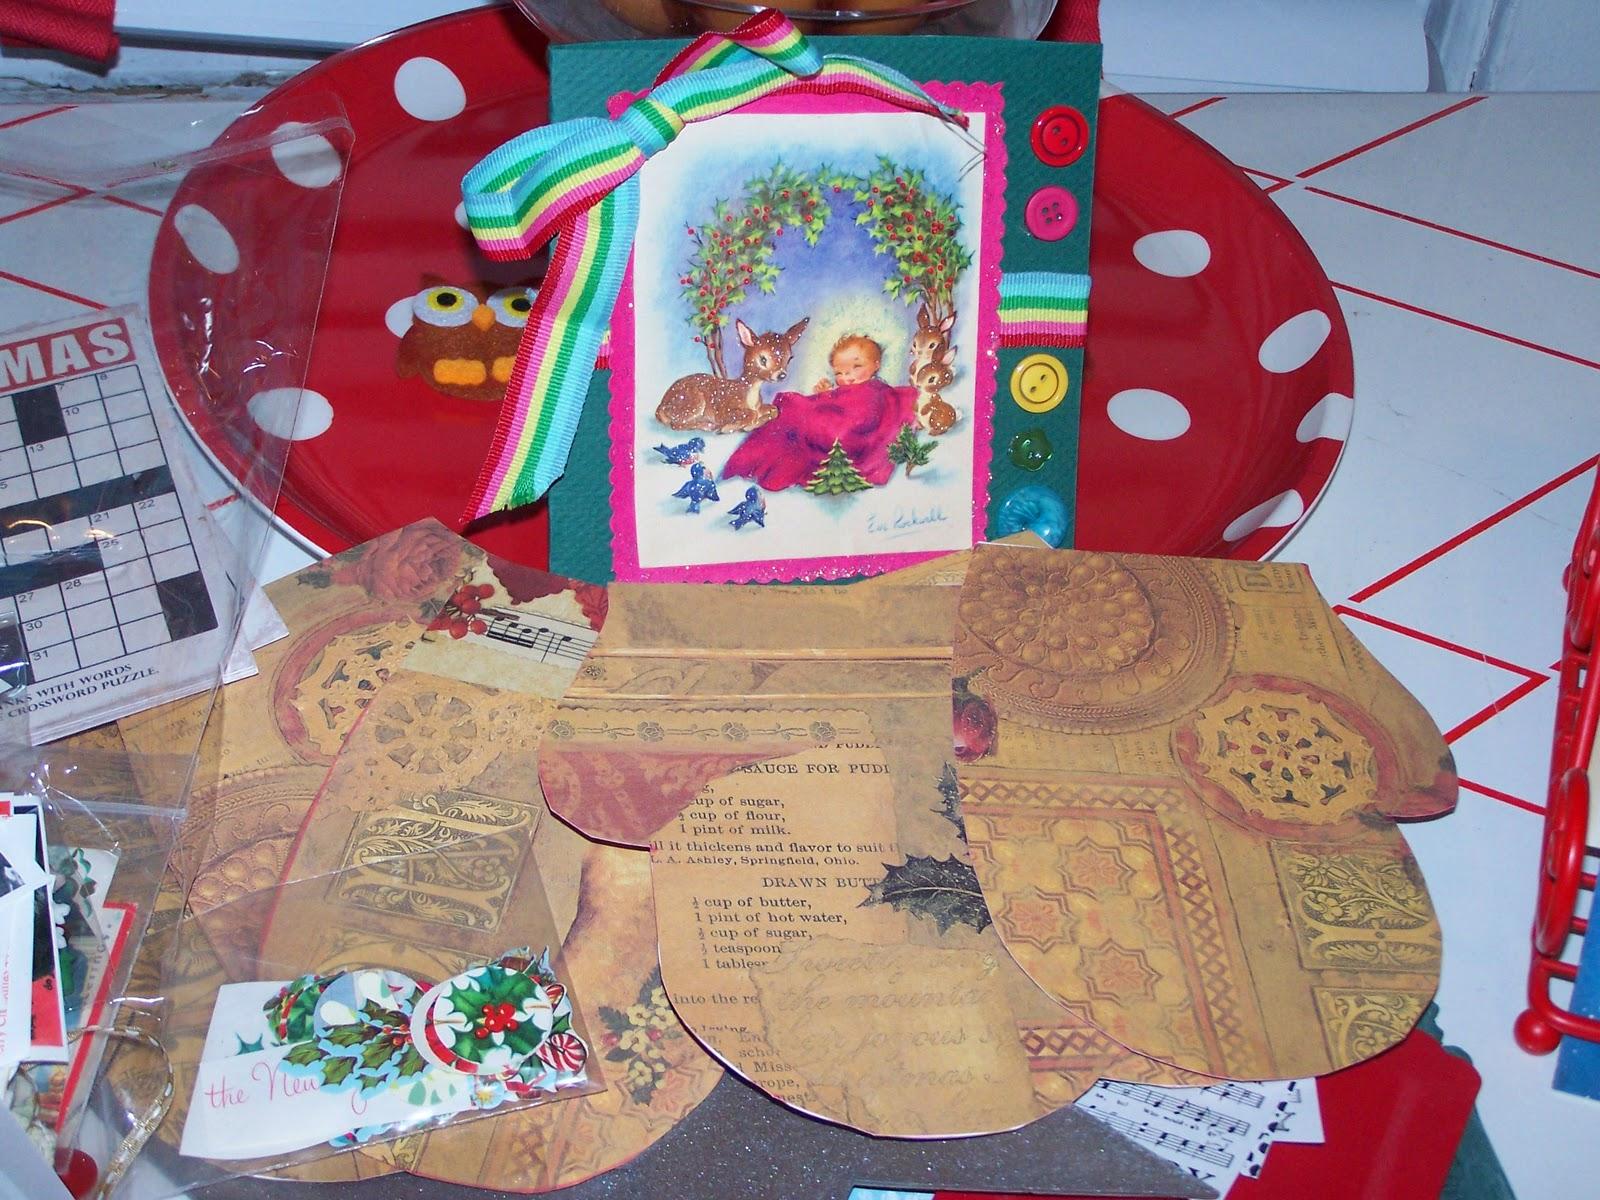 http://2.bp.blogspot.com/_SrV3elZ-fGo/TOIIqKSXIXI/AAAAAAAAI6w/st2guyHO7Ms/s1600/christmas-goods-2.jpg